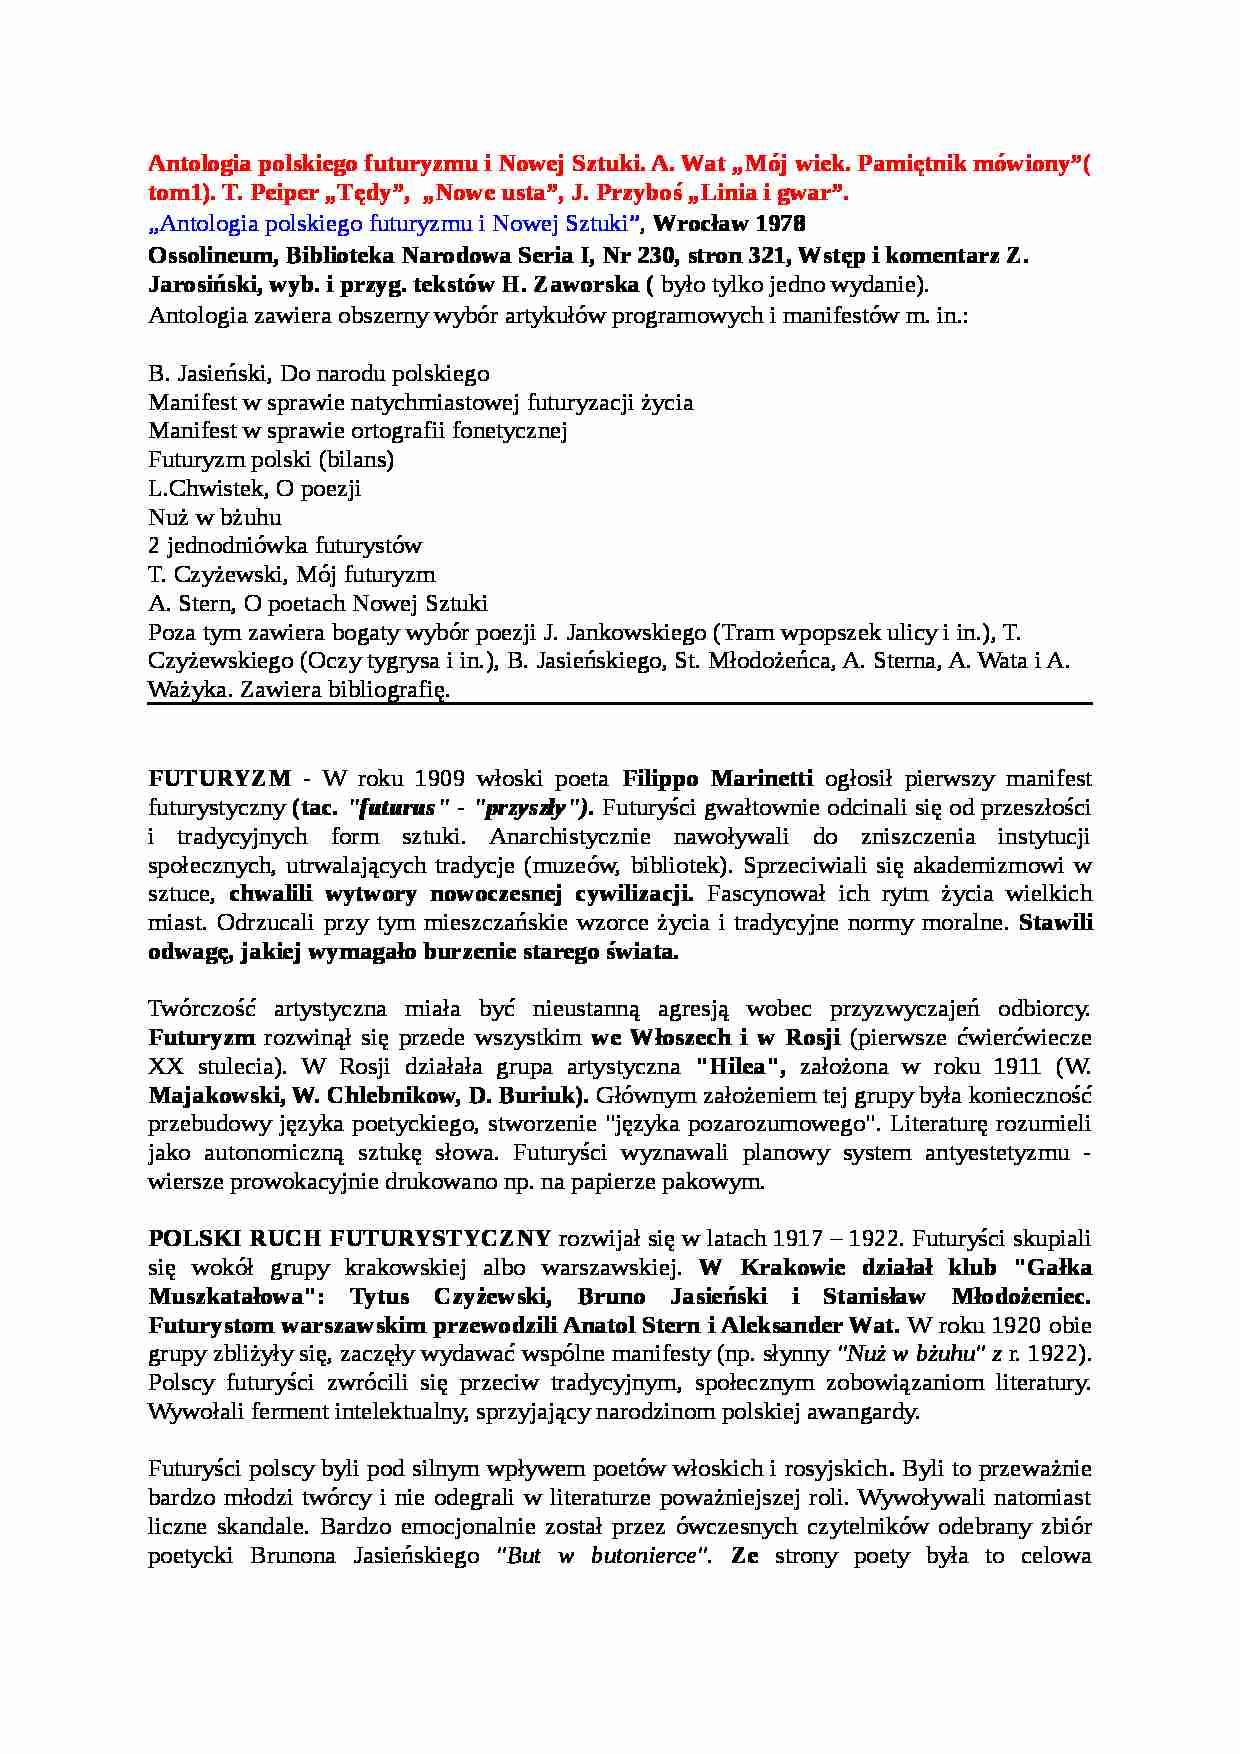 Antologia Polskiego Futuryzmu I Nowej Sztuki Futuryzm